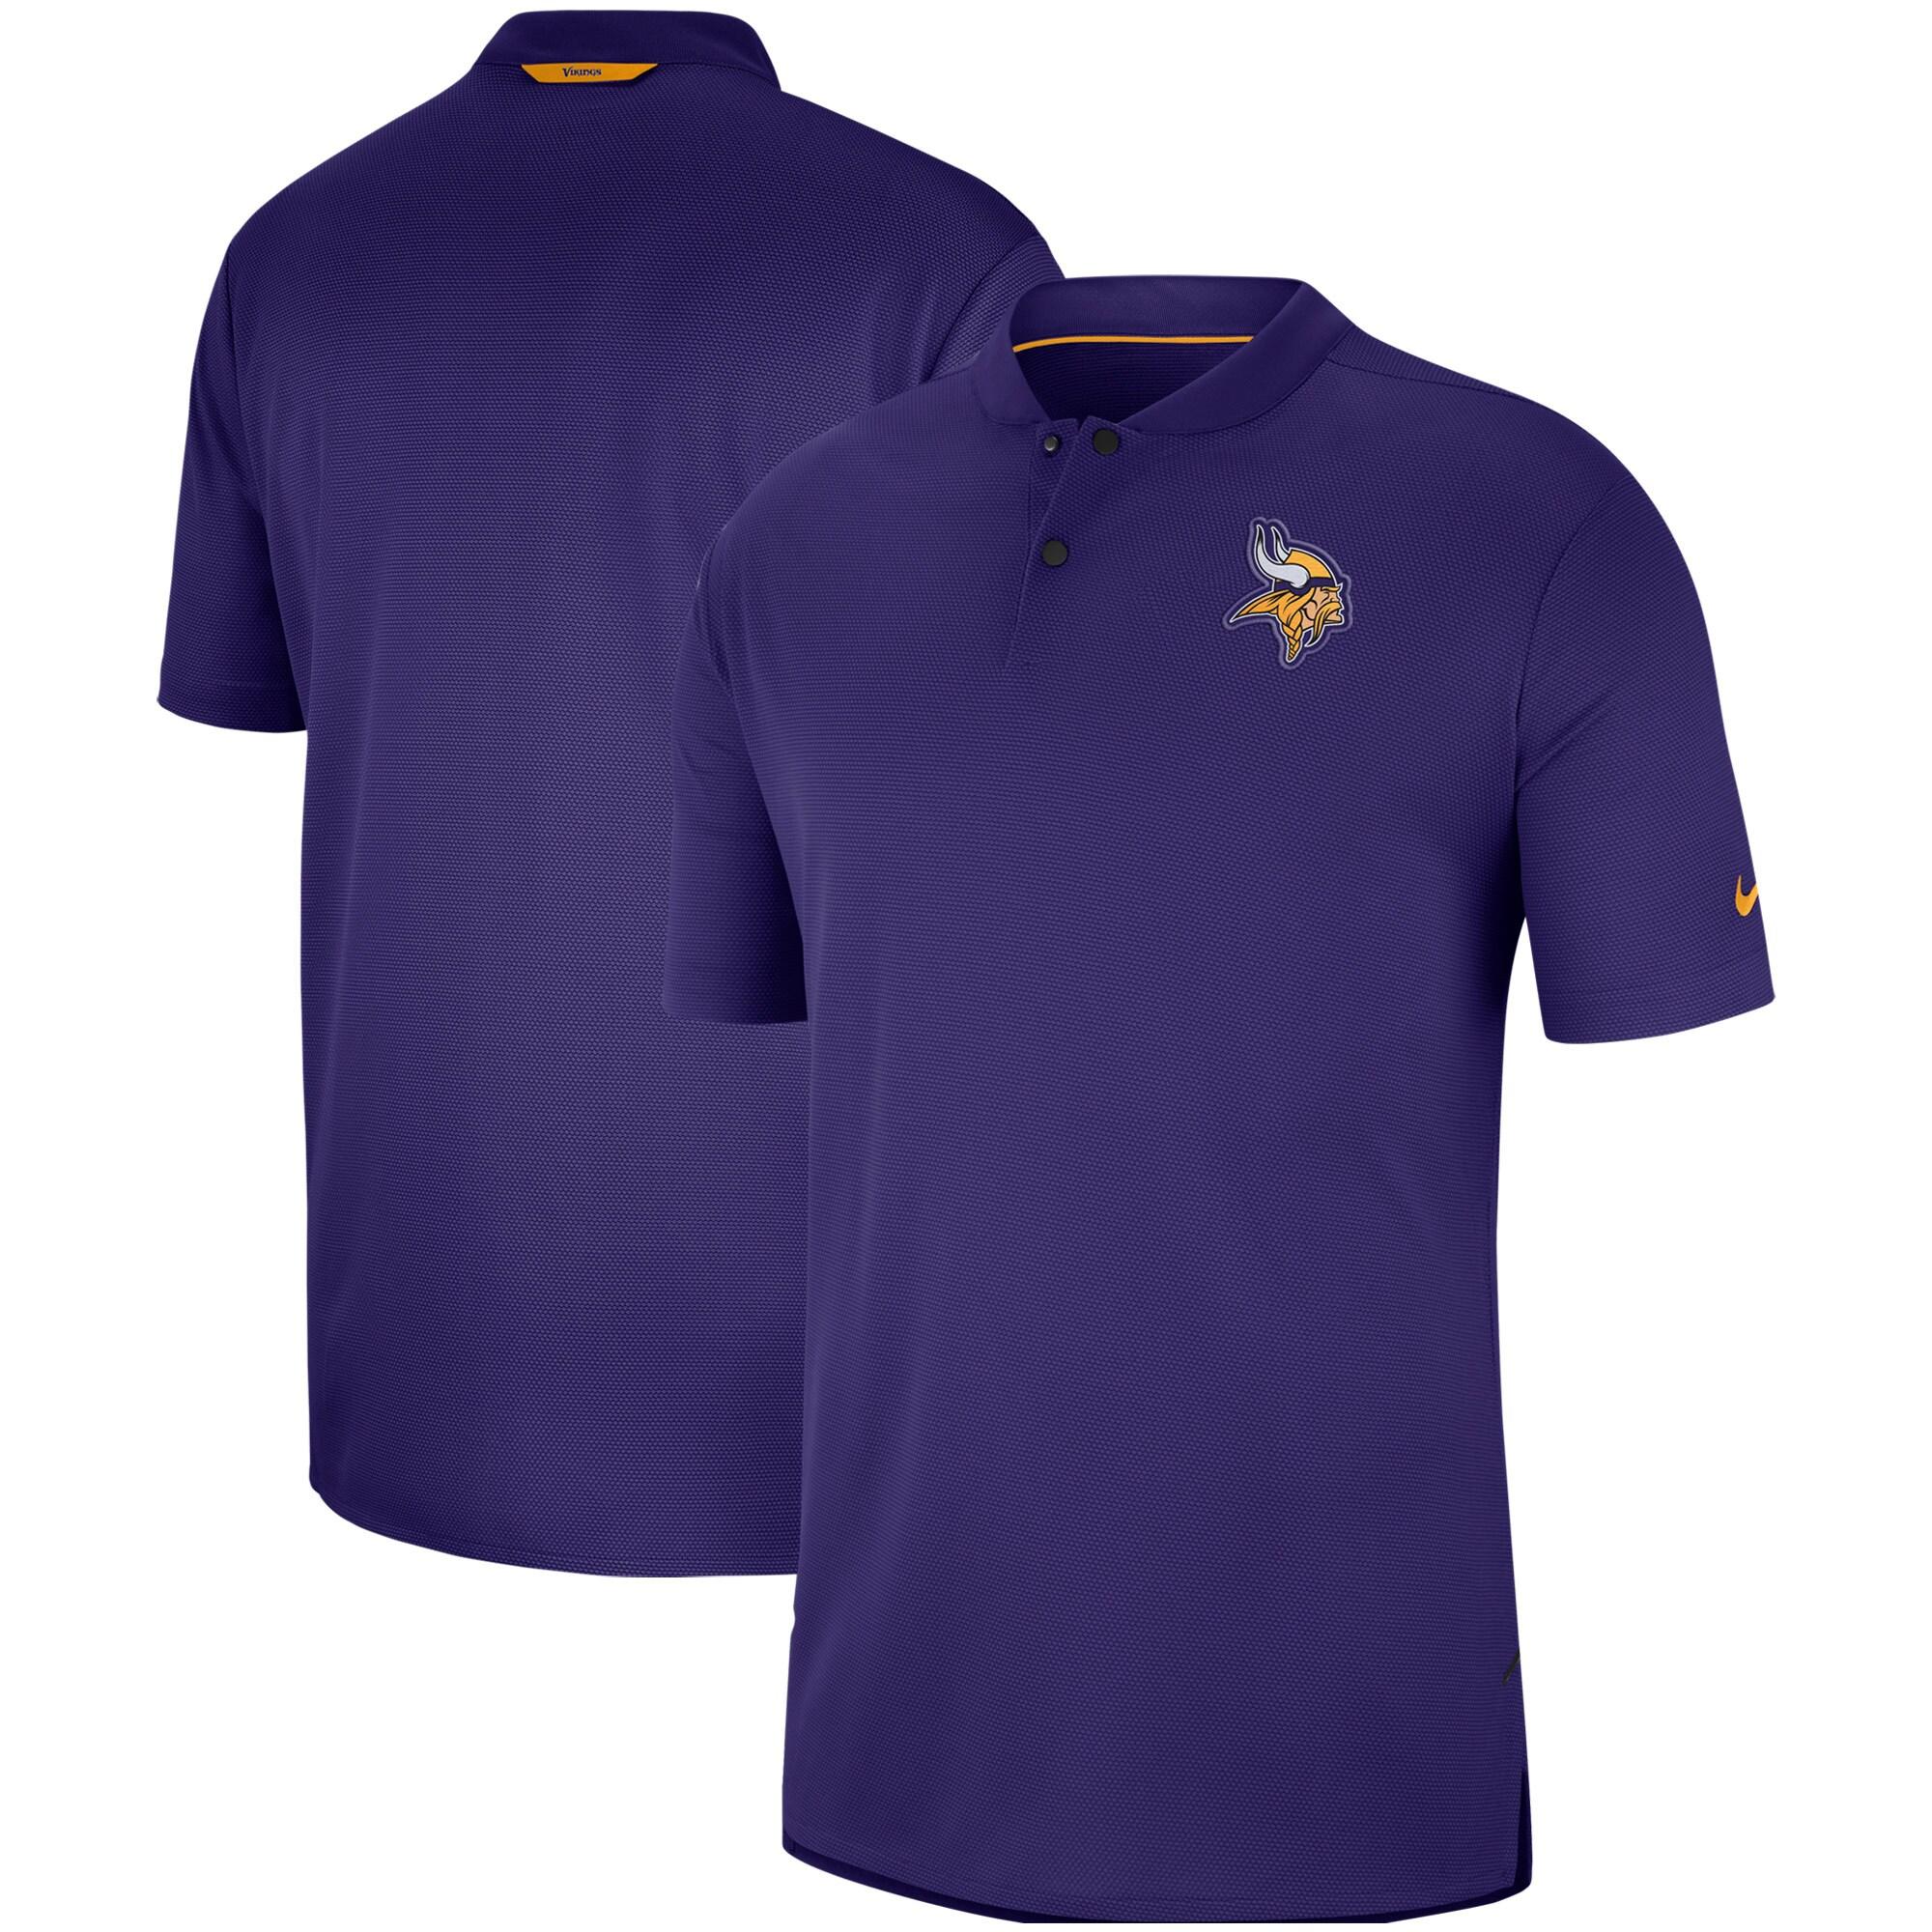 Minnesota Vikings Nike Sideline Elite Coaches Performance Polo - Purple